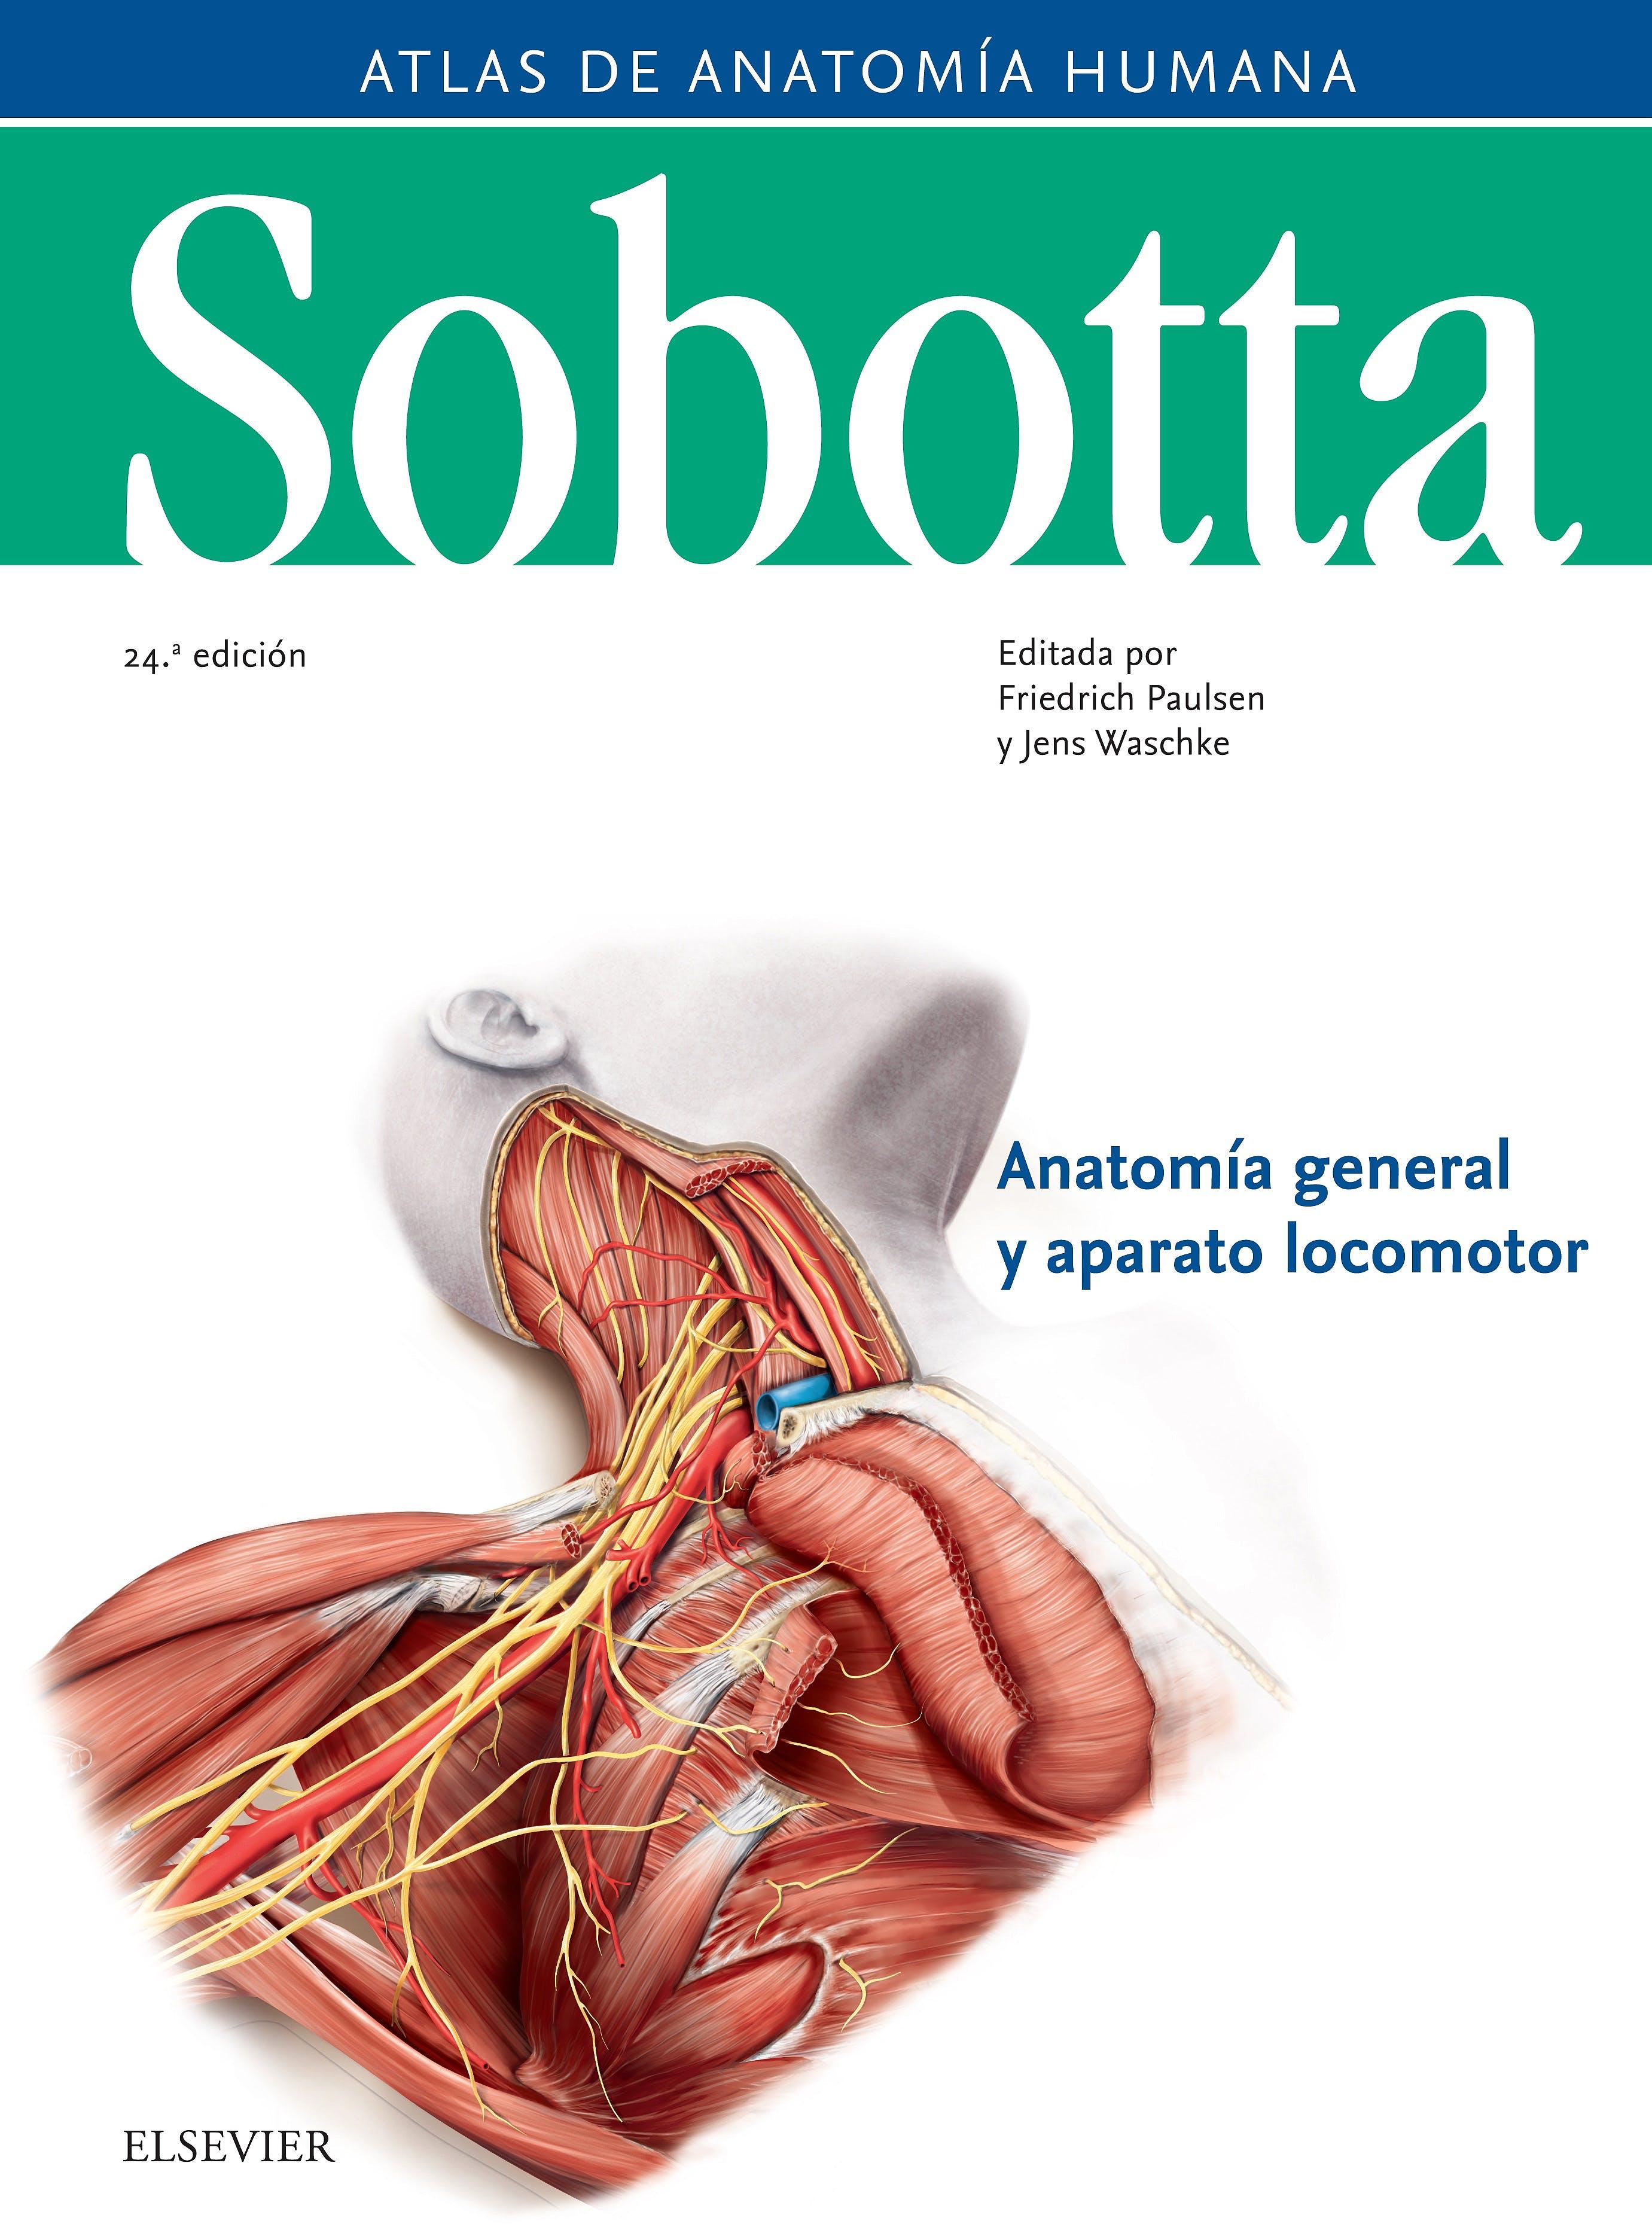 sobotta atlas anatomía humana - Iberlibro